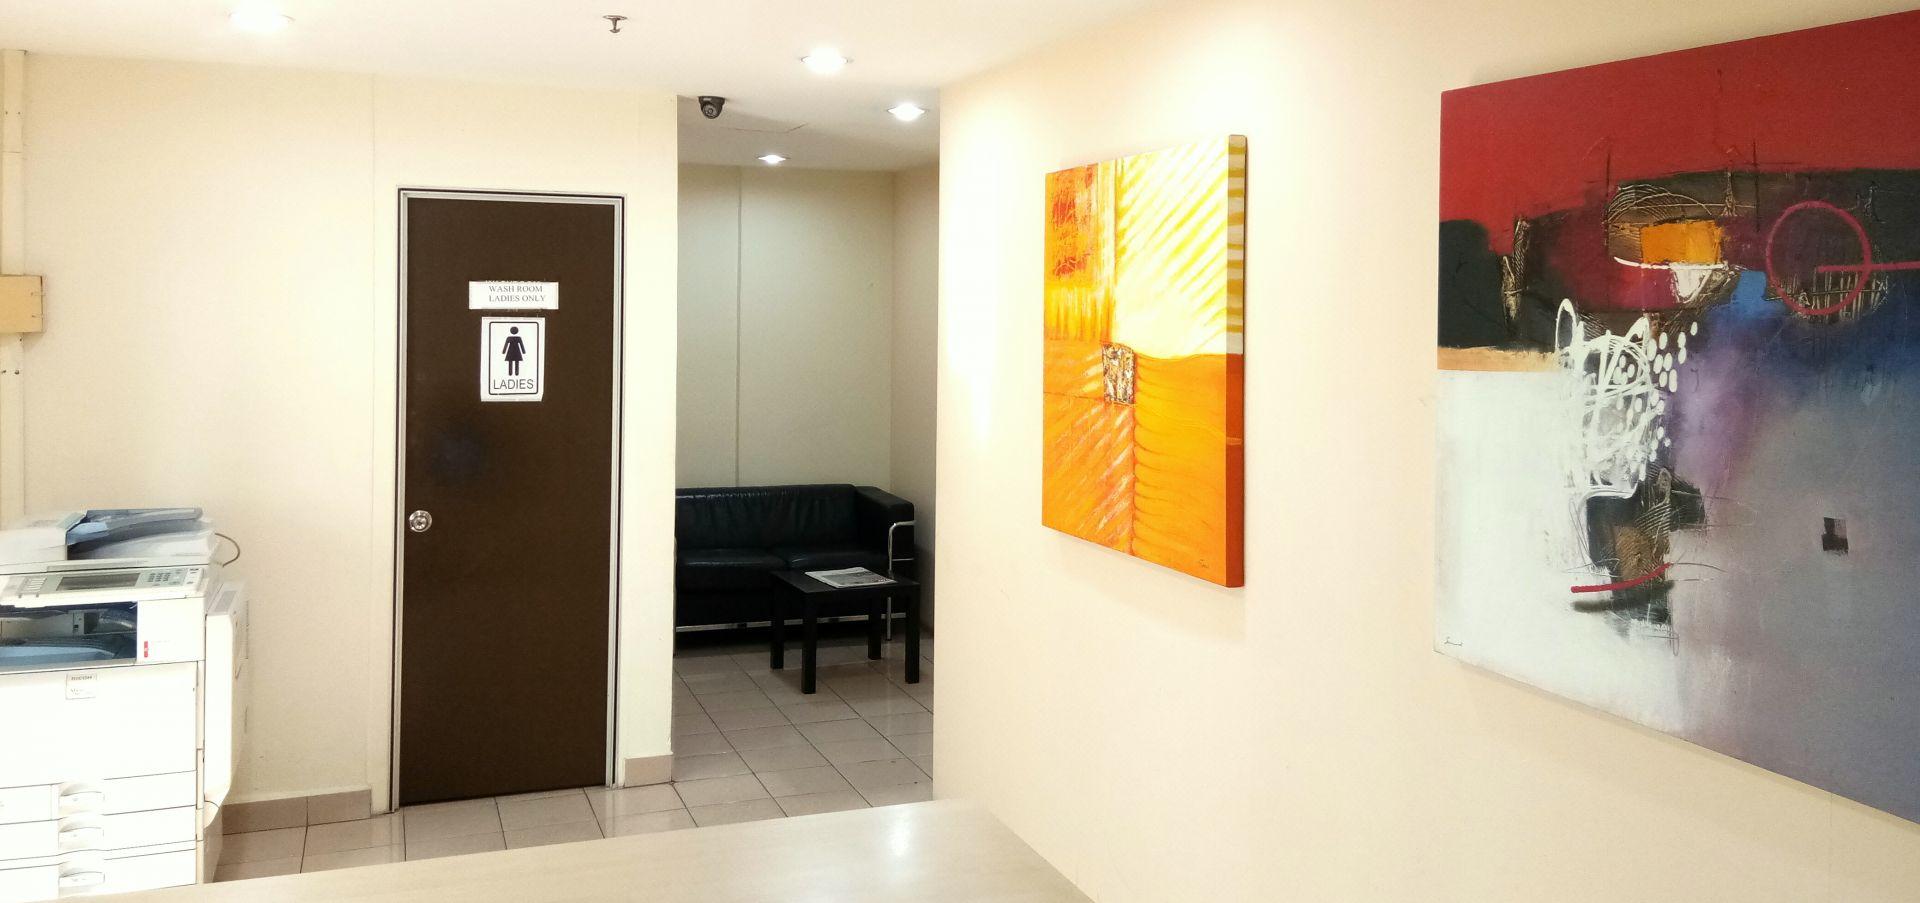 Avenue Business Centre Sunway Mentari, Petaling Jaya